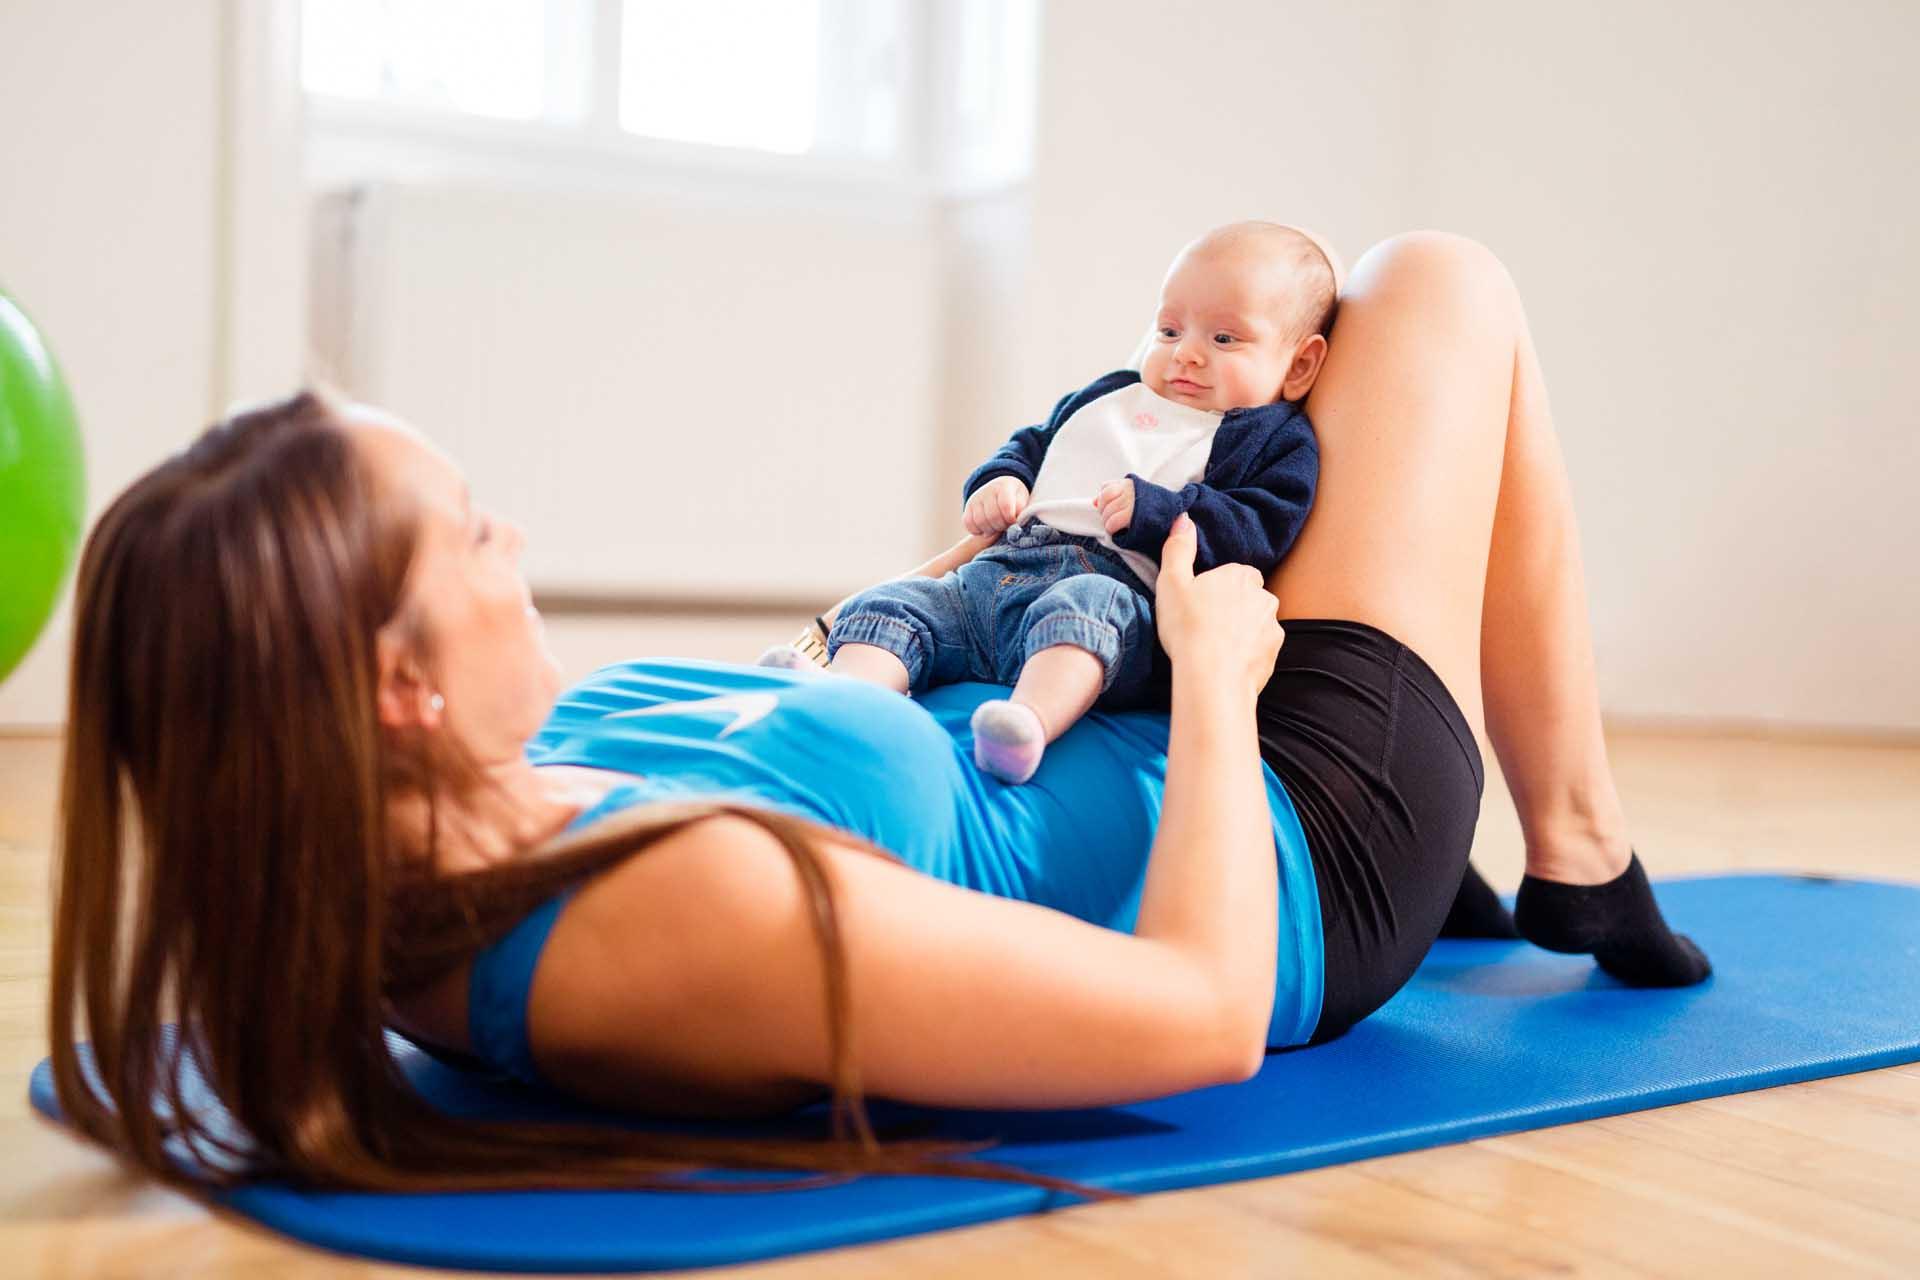 Beckenbodengymnastik, Rückbildungsgymnastik bei Kinemedic - Praxis für physikalische und rehabilitative Medizin